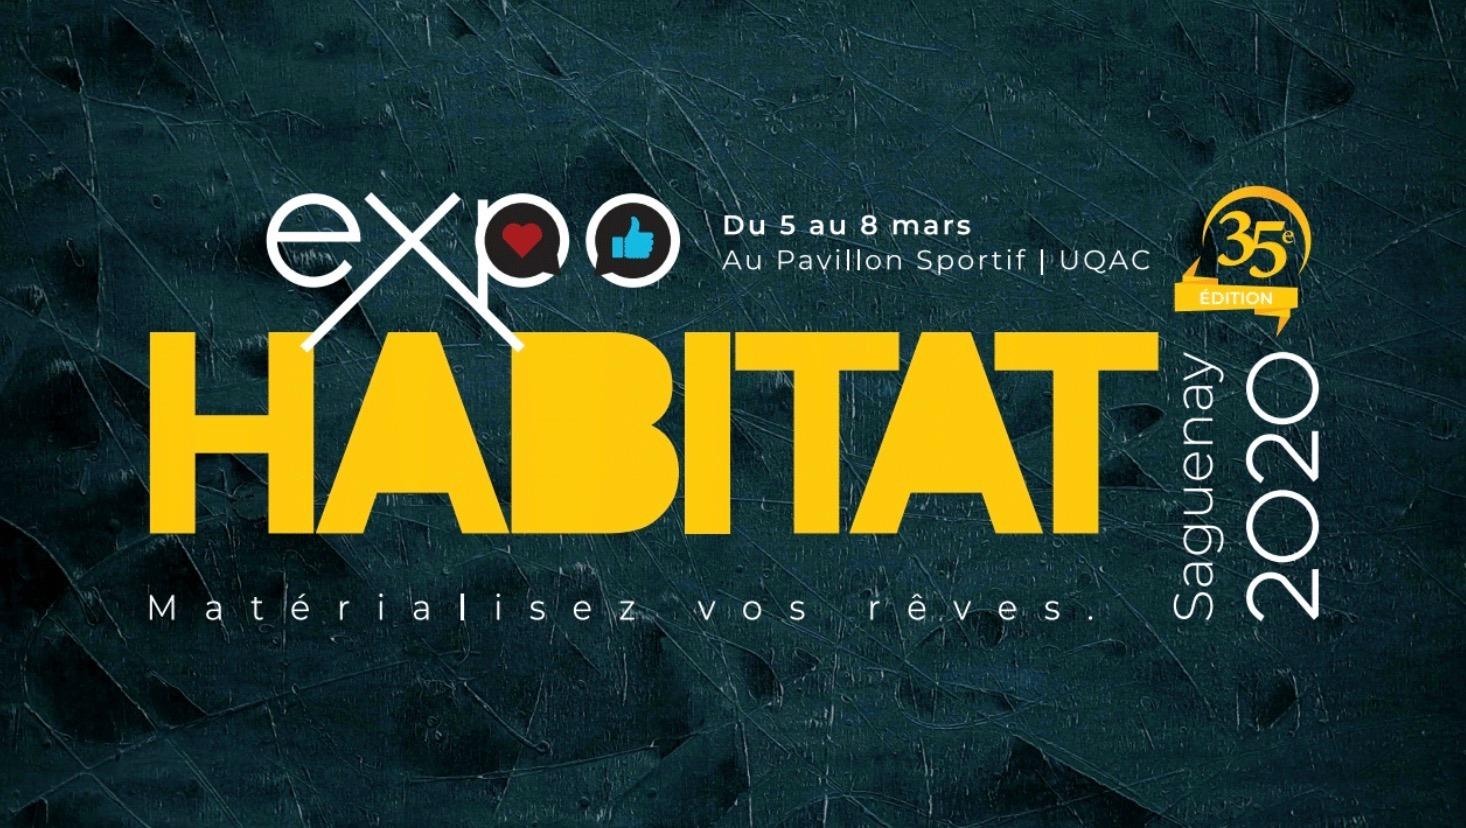 Expo Habitat Saguenay